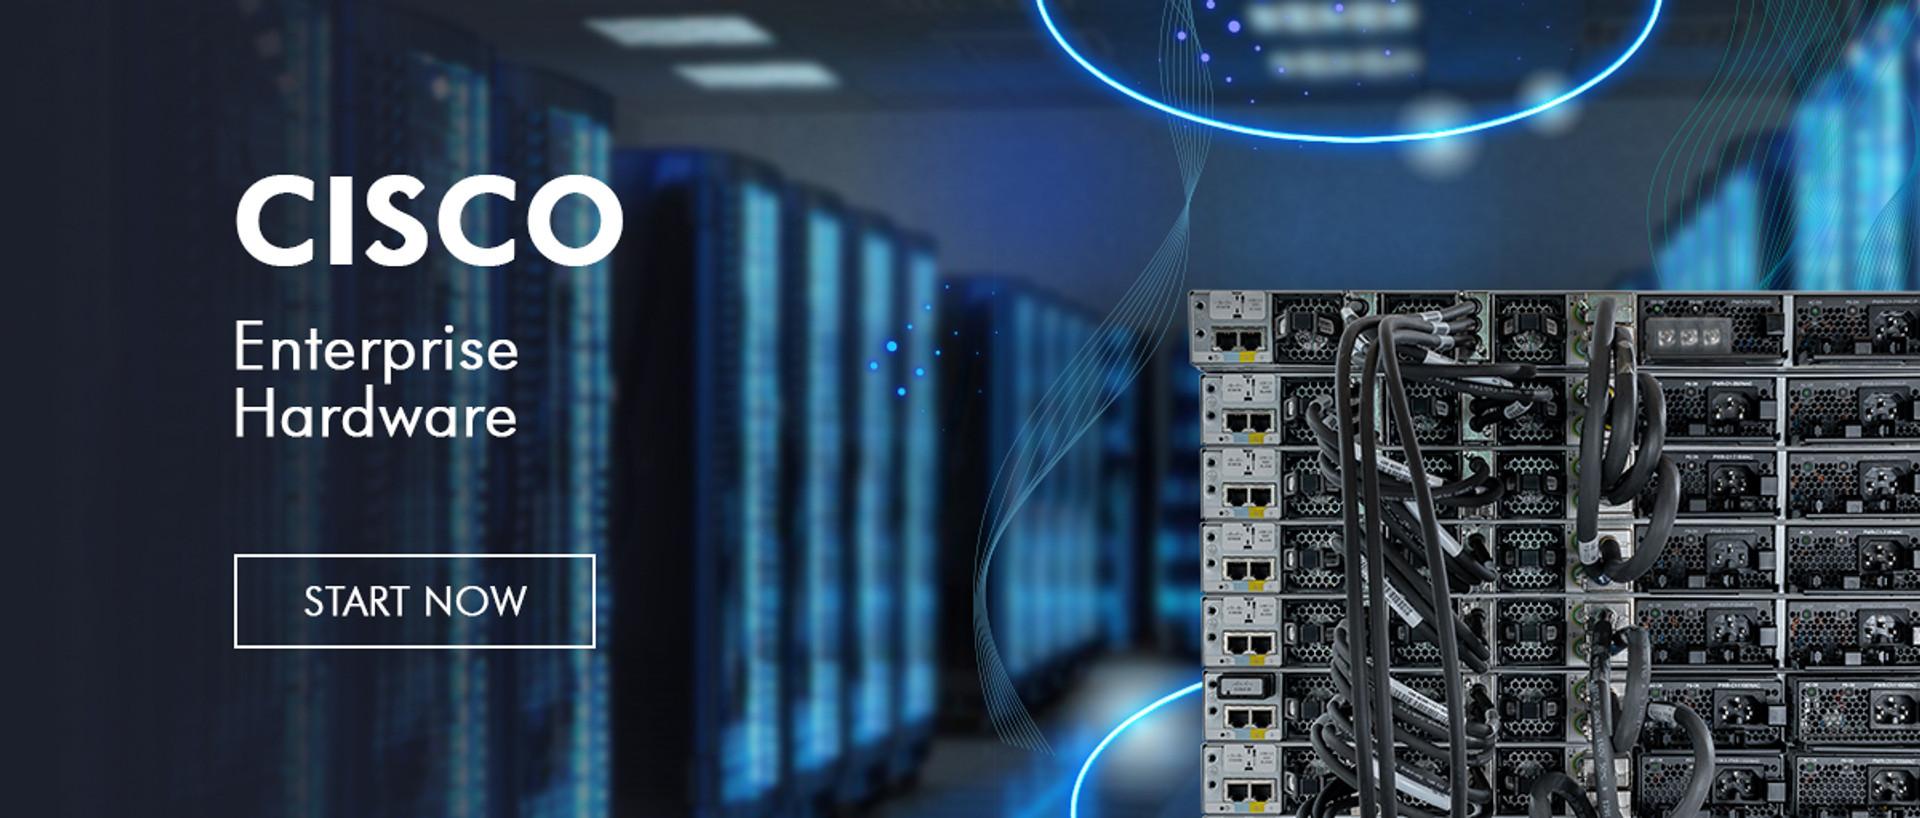 Cisco Enterprise Hardware